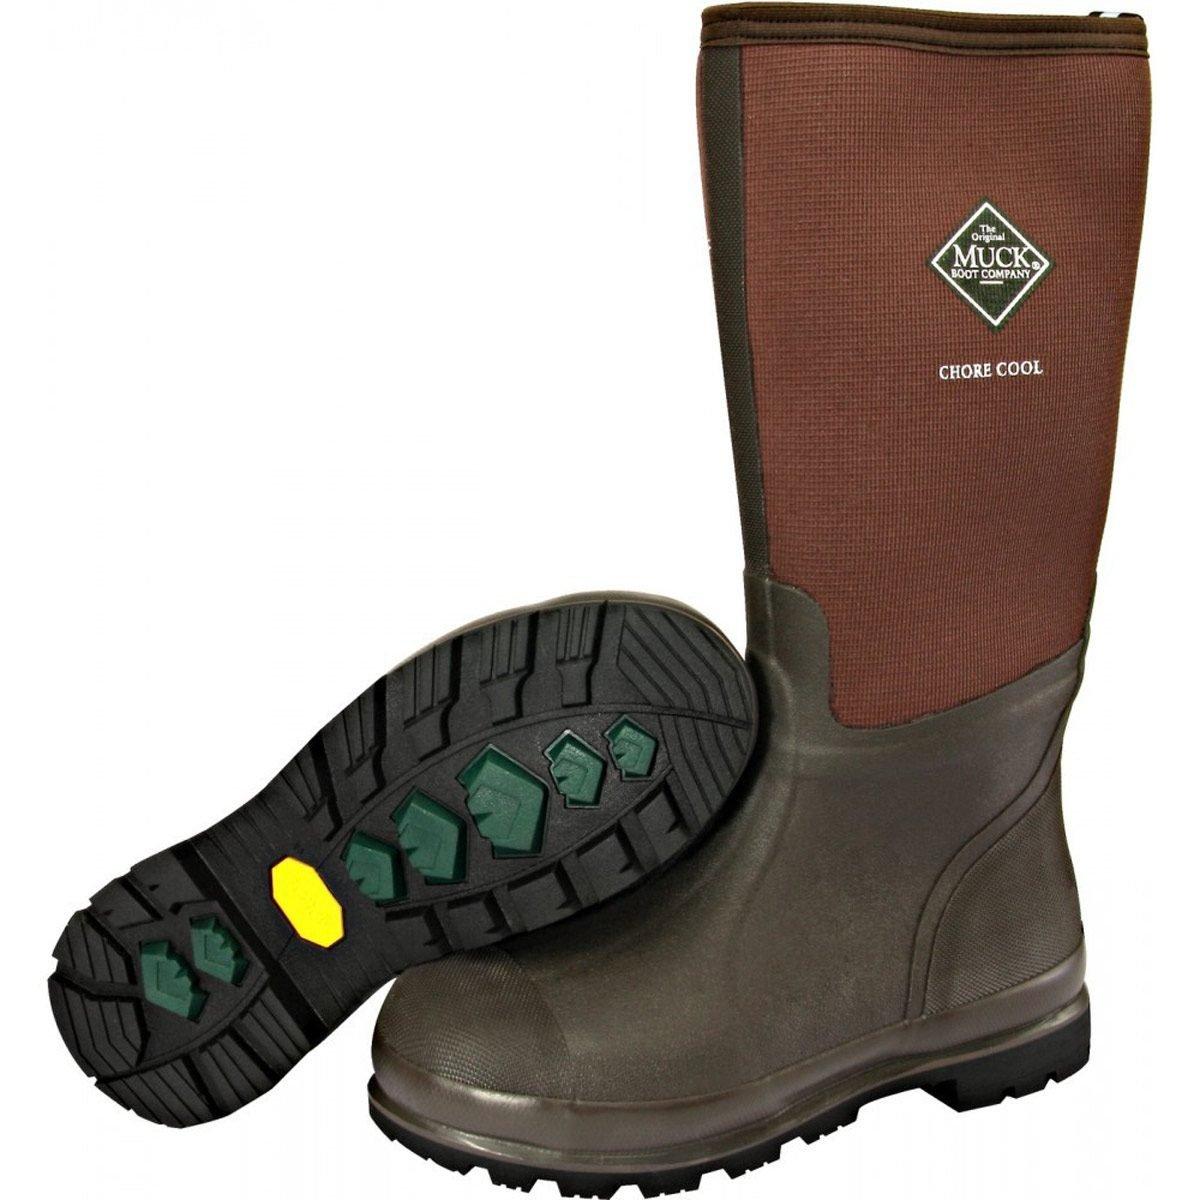 cc mens farmer comforter comfortable cebu with brown work goodyear style brand botas roper toro boots model afarmer ce